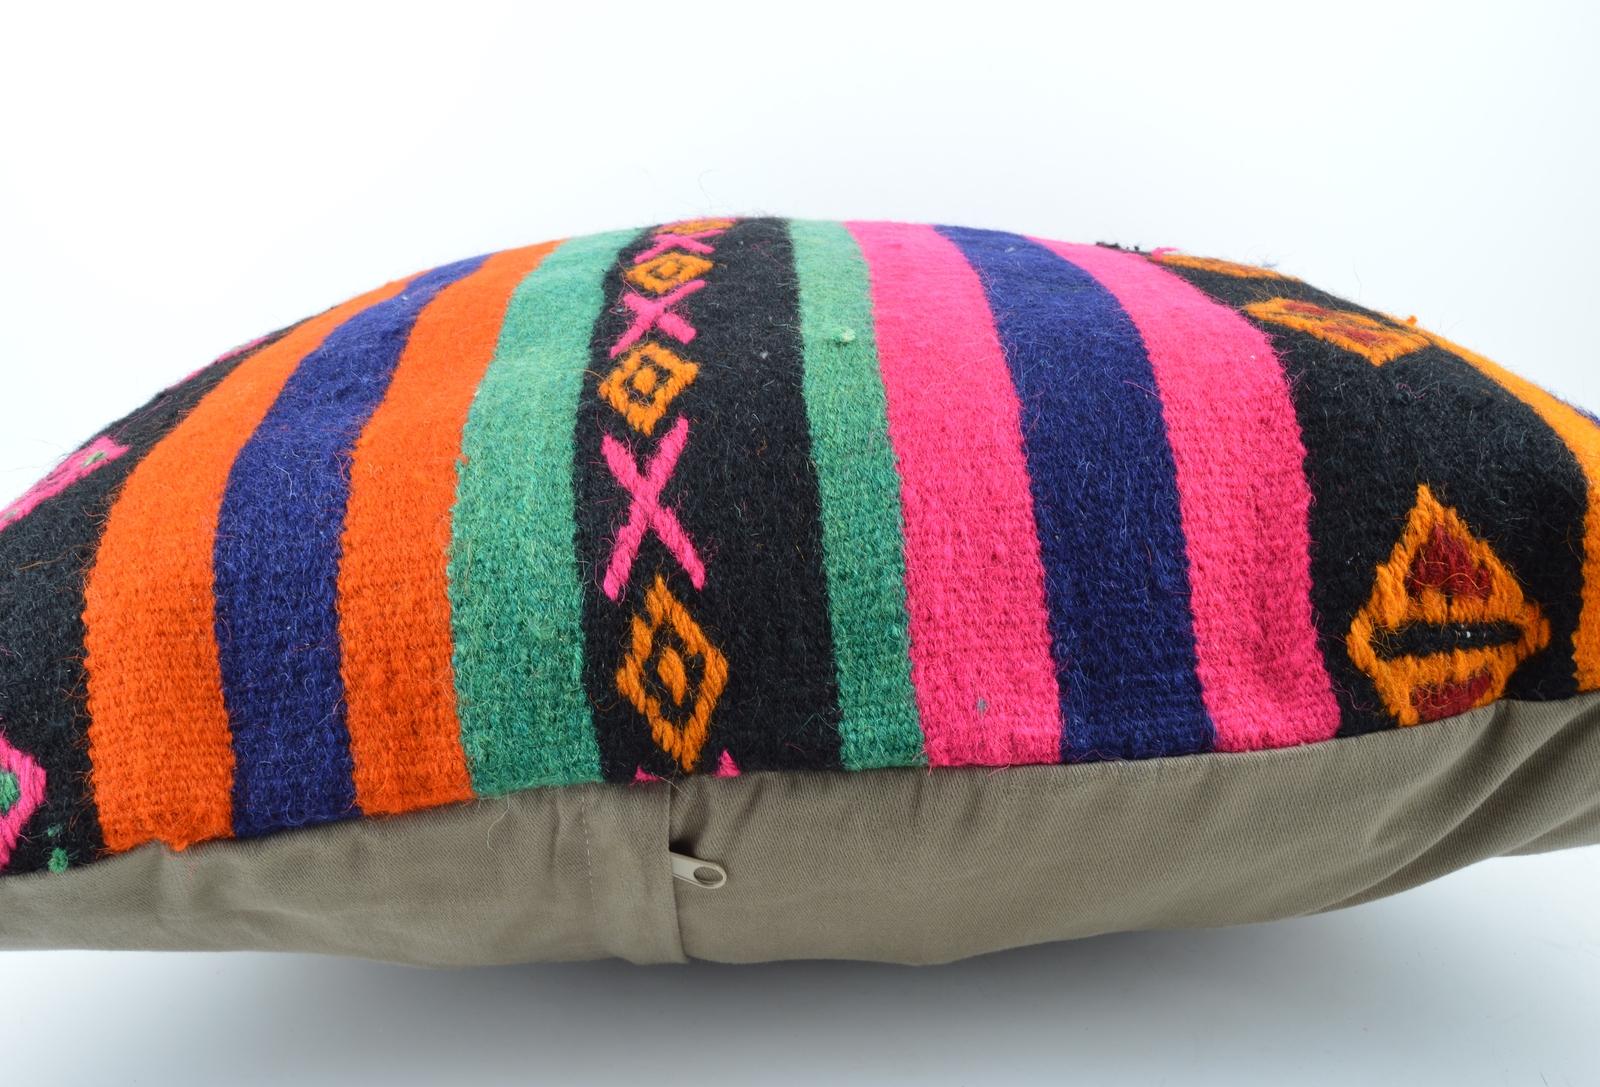 24x24'' large kilim pillow big pillow decorative pillow cover large cushion case